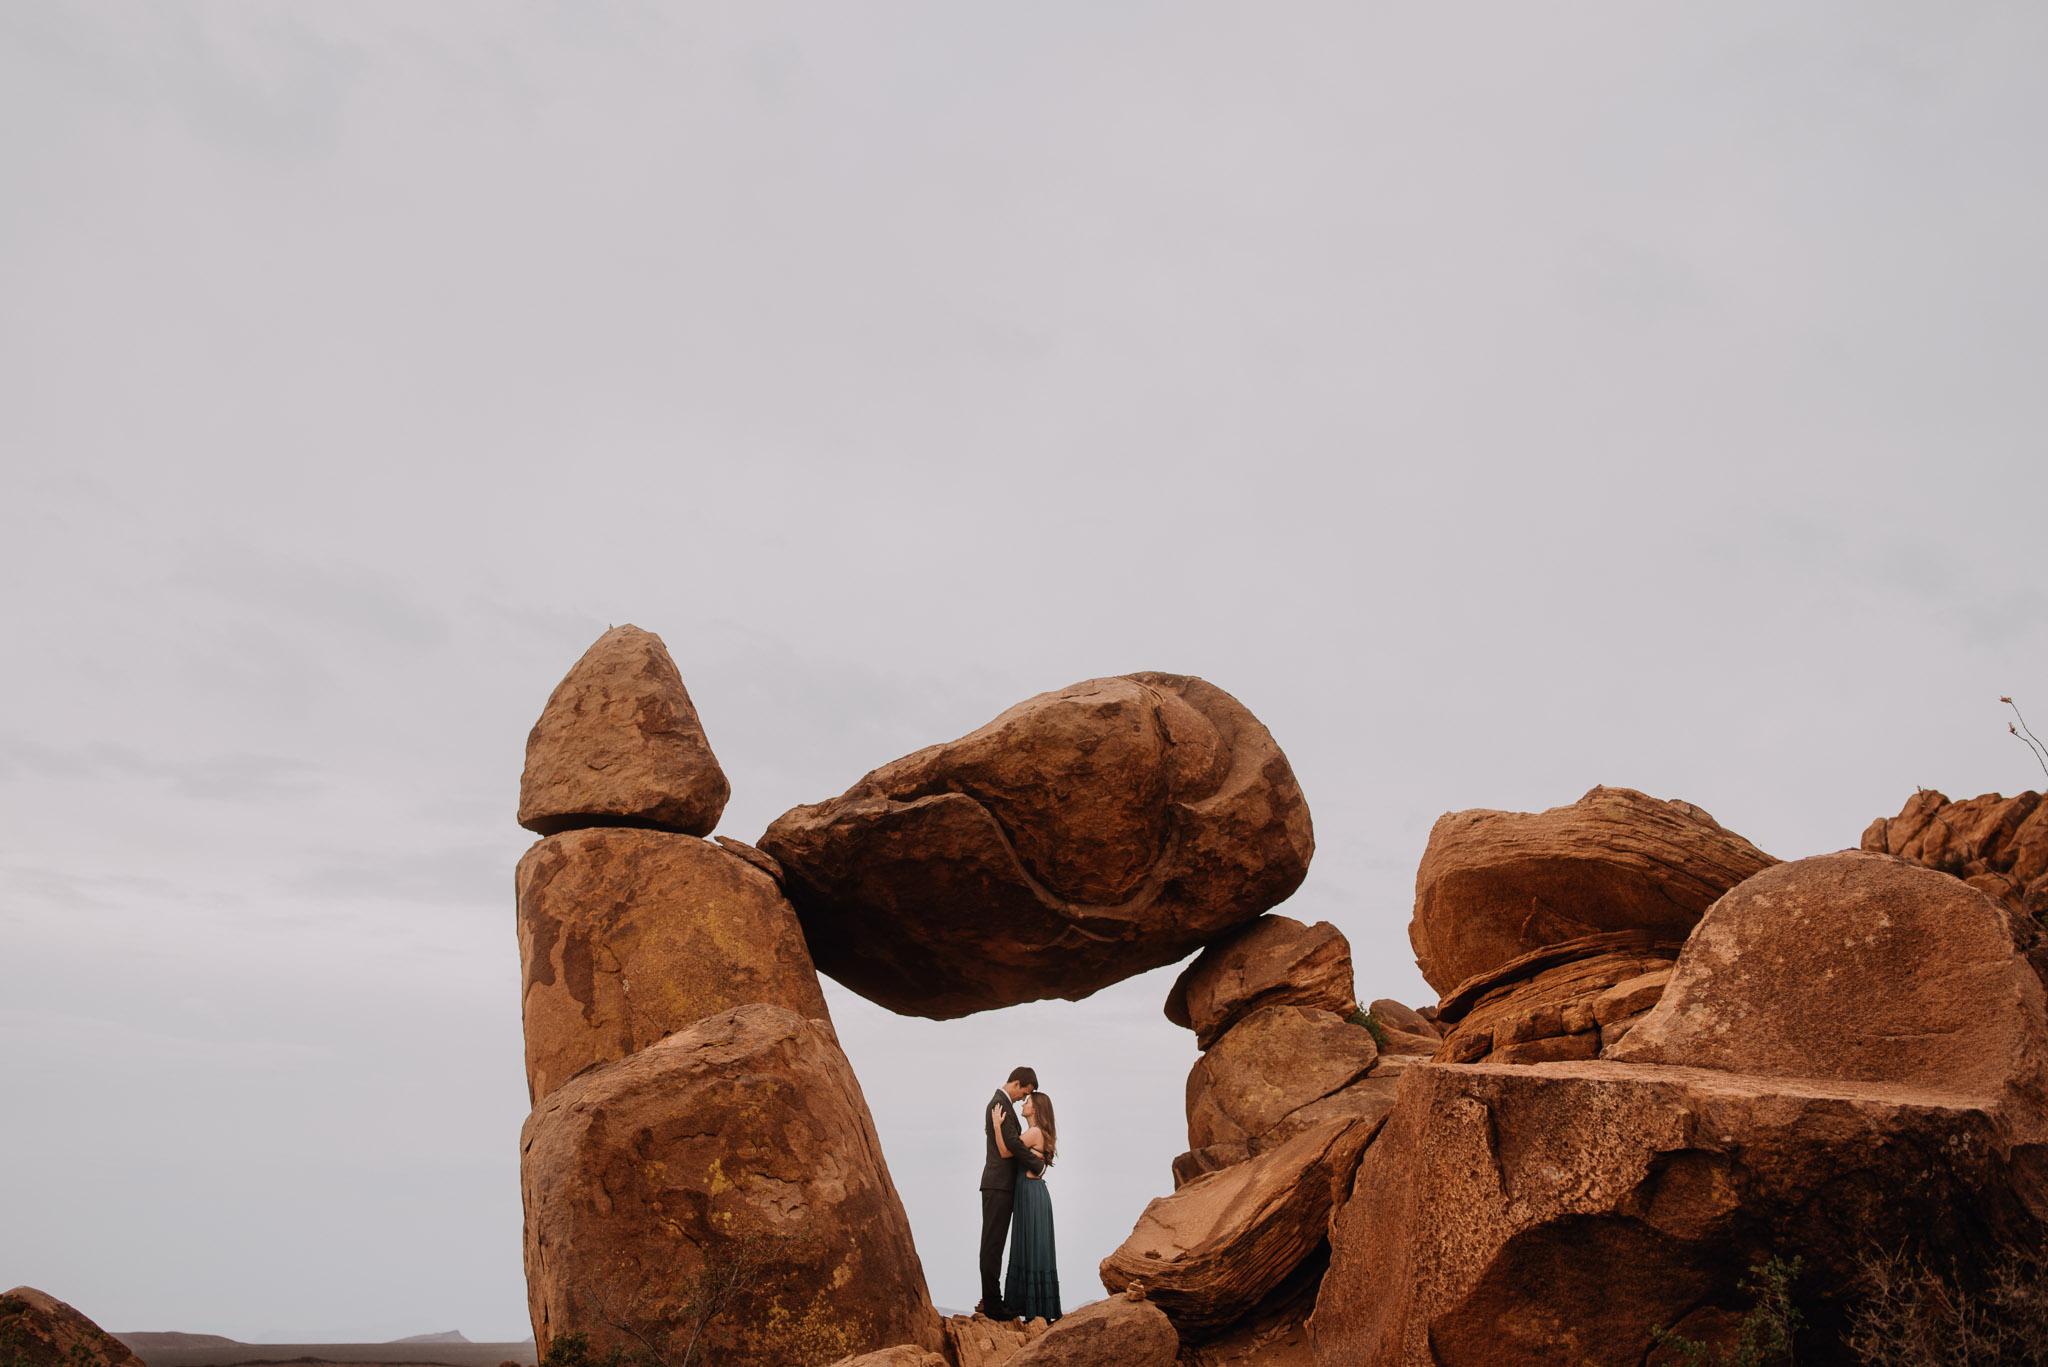 deset-elopement-big-bend-engagement-photos14.jpg